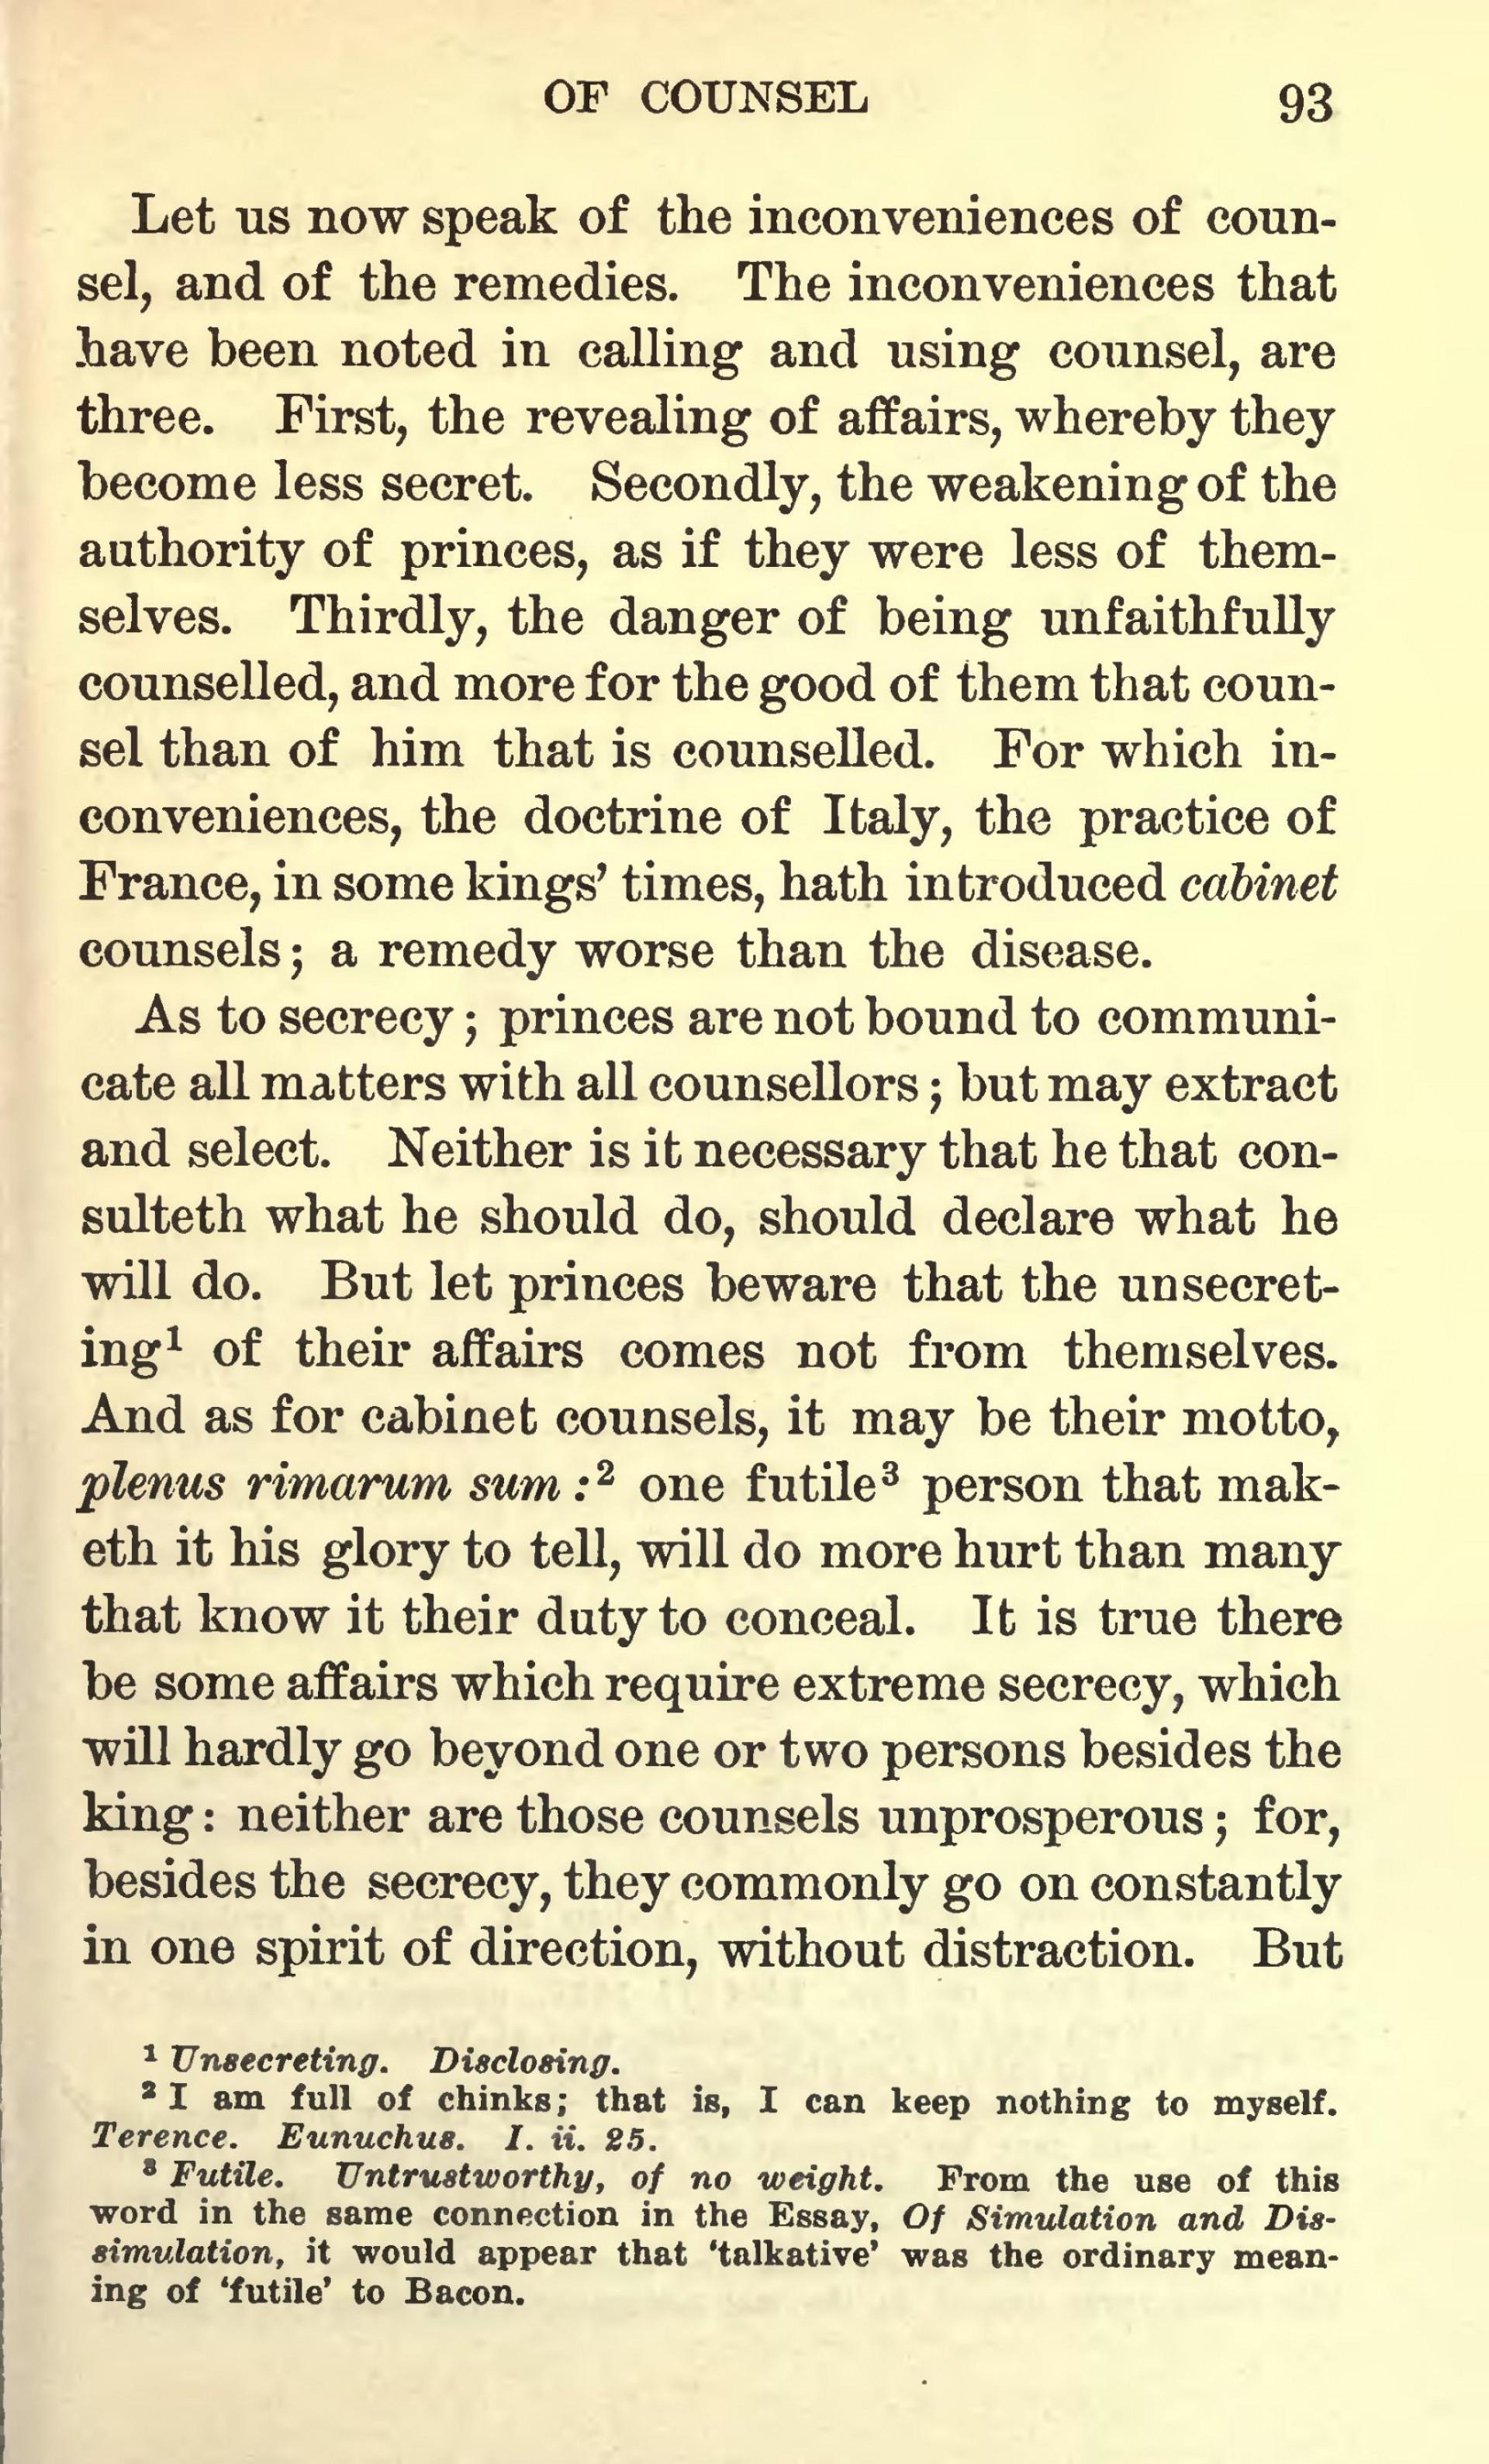 007 Page203 1728px Essays Of Francis Bacon 1908 Scott Djvu Bacons Essay Amazing In Urdu Pdf Truth Summary 1920